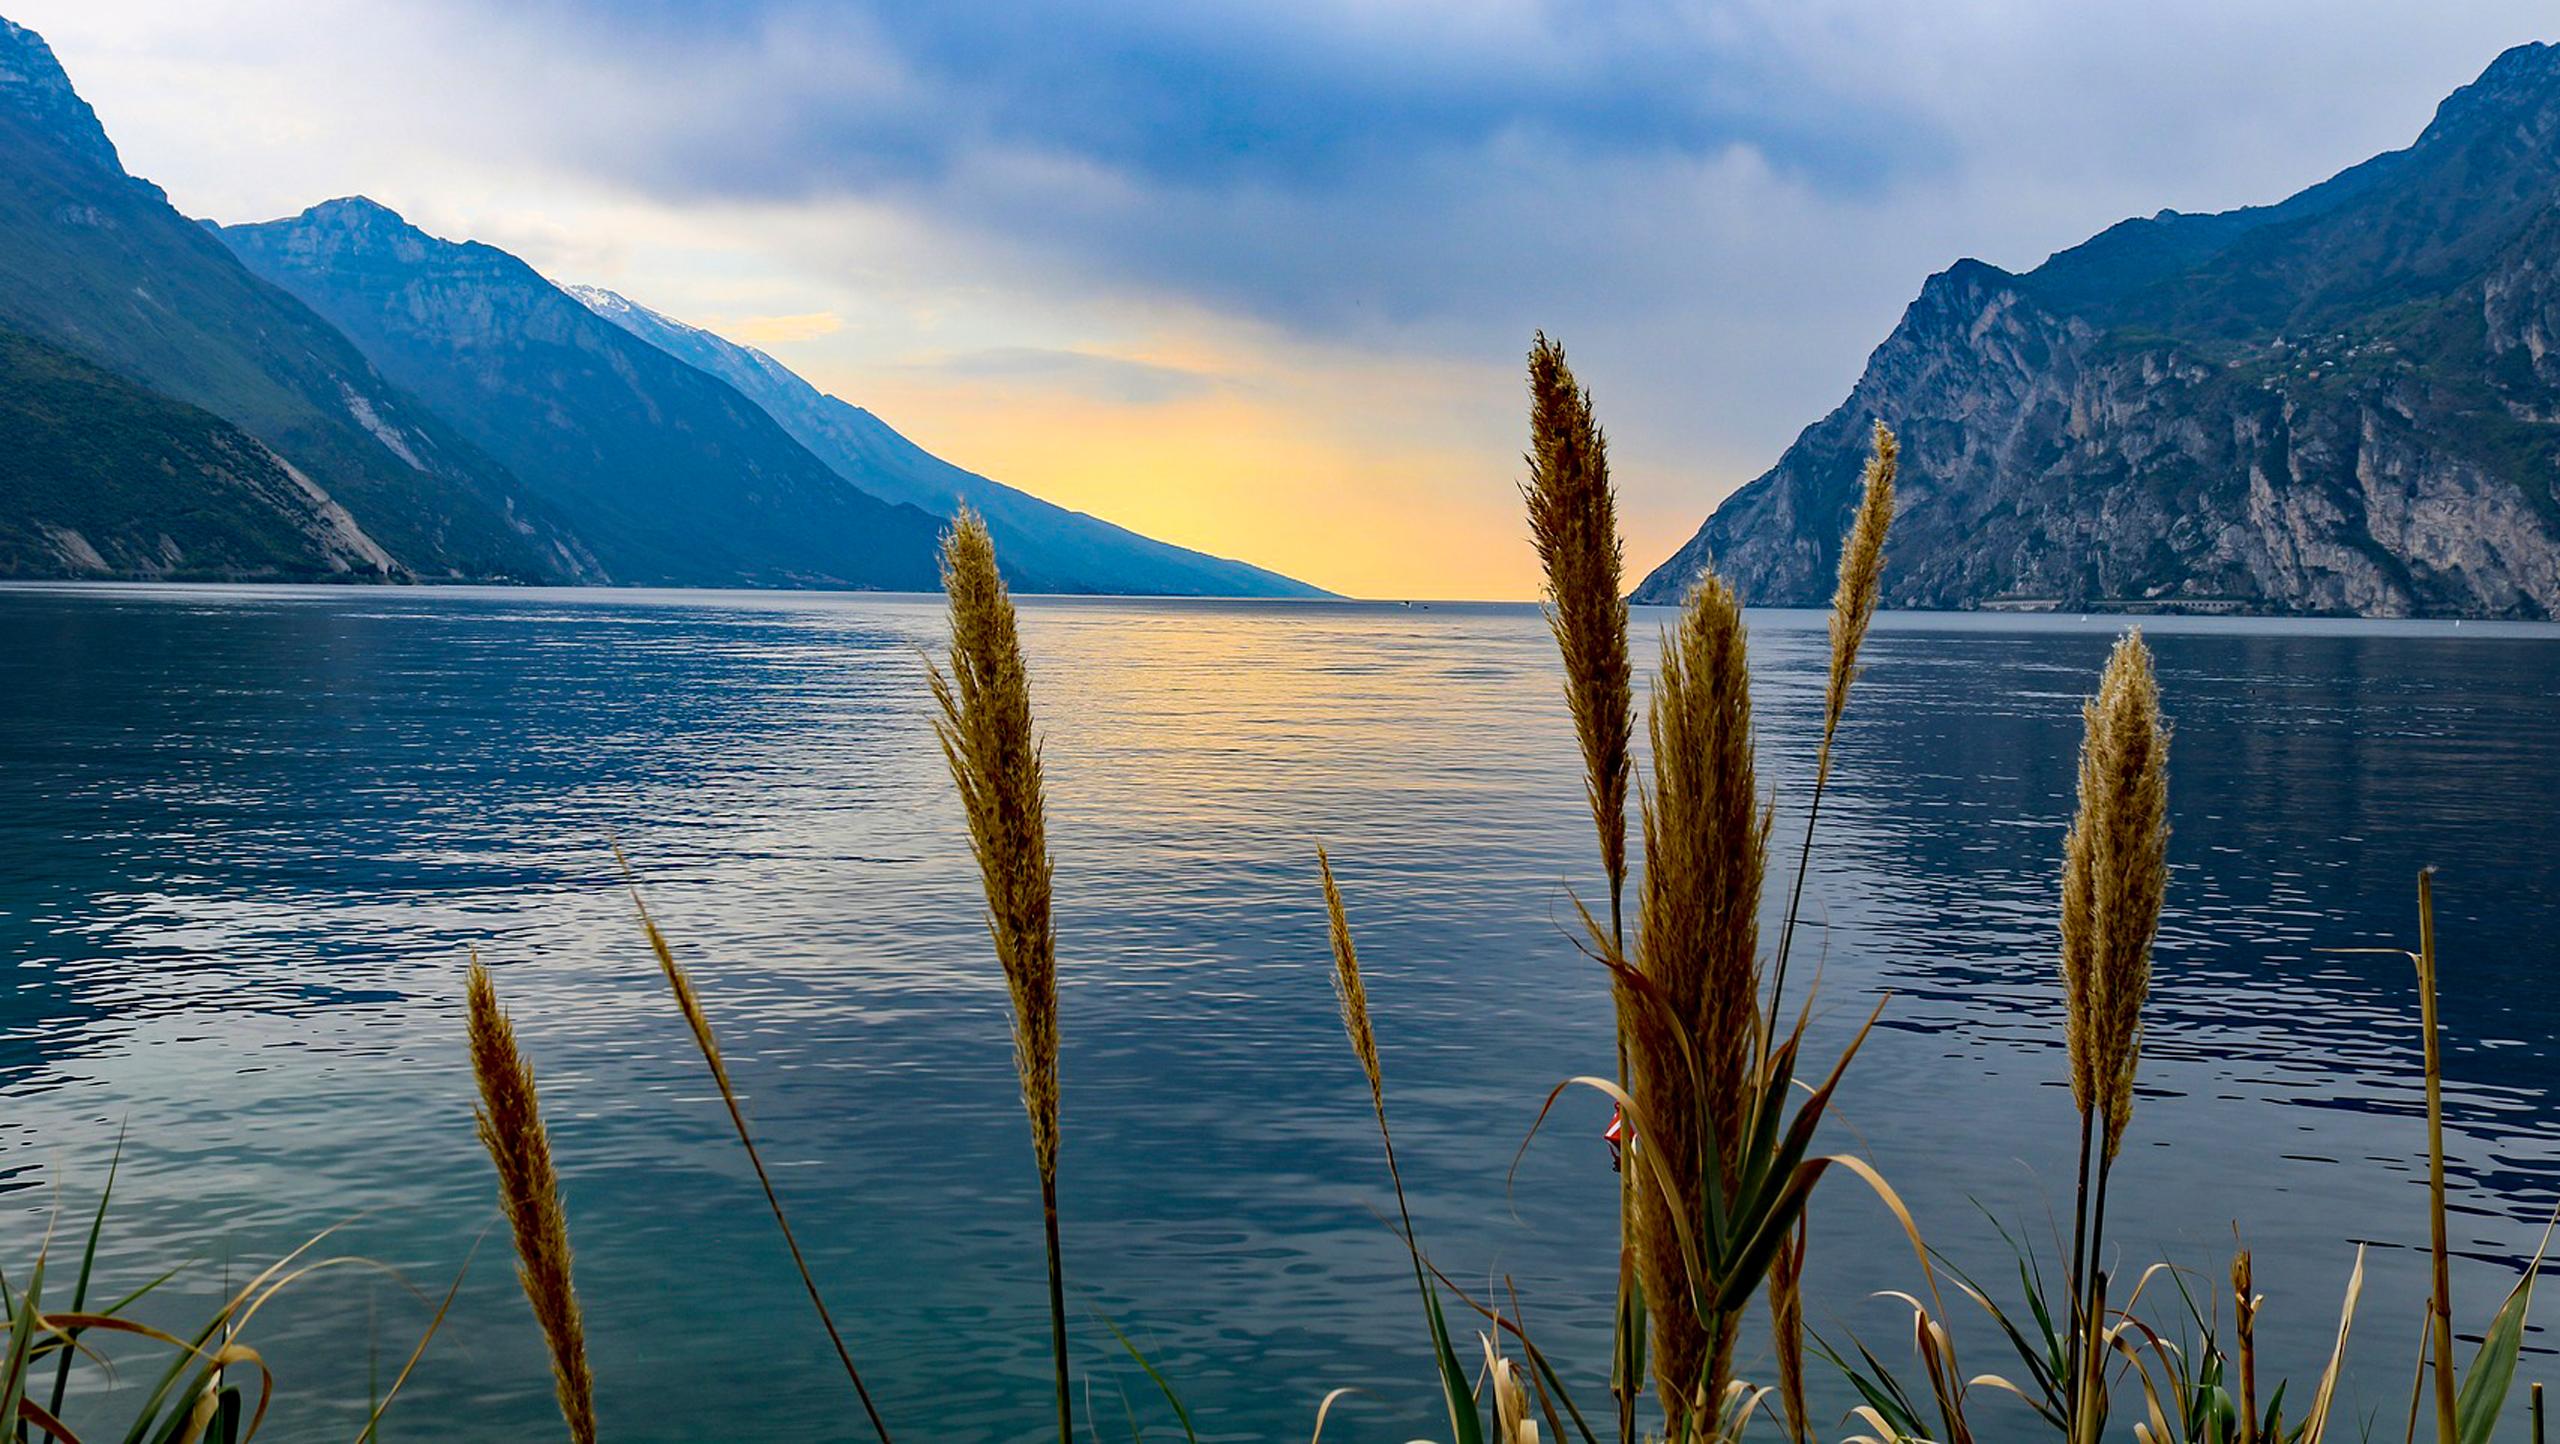 South Tyrol to Lake Garda Bike Tour